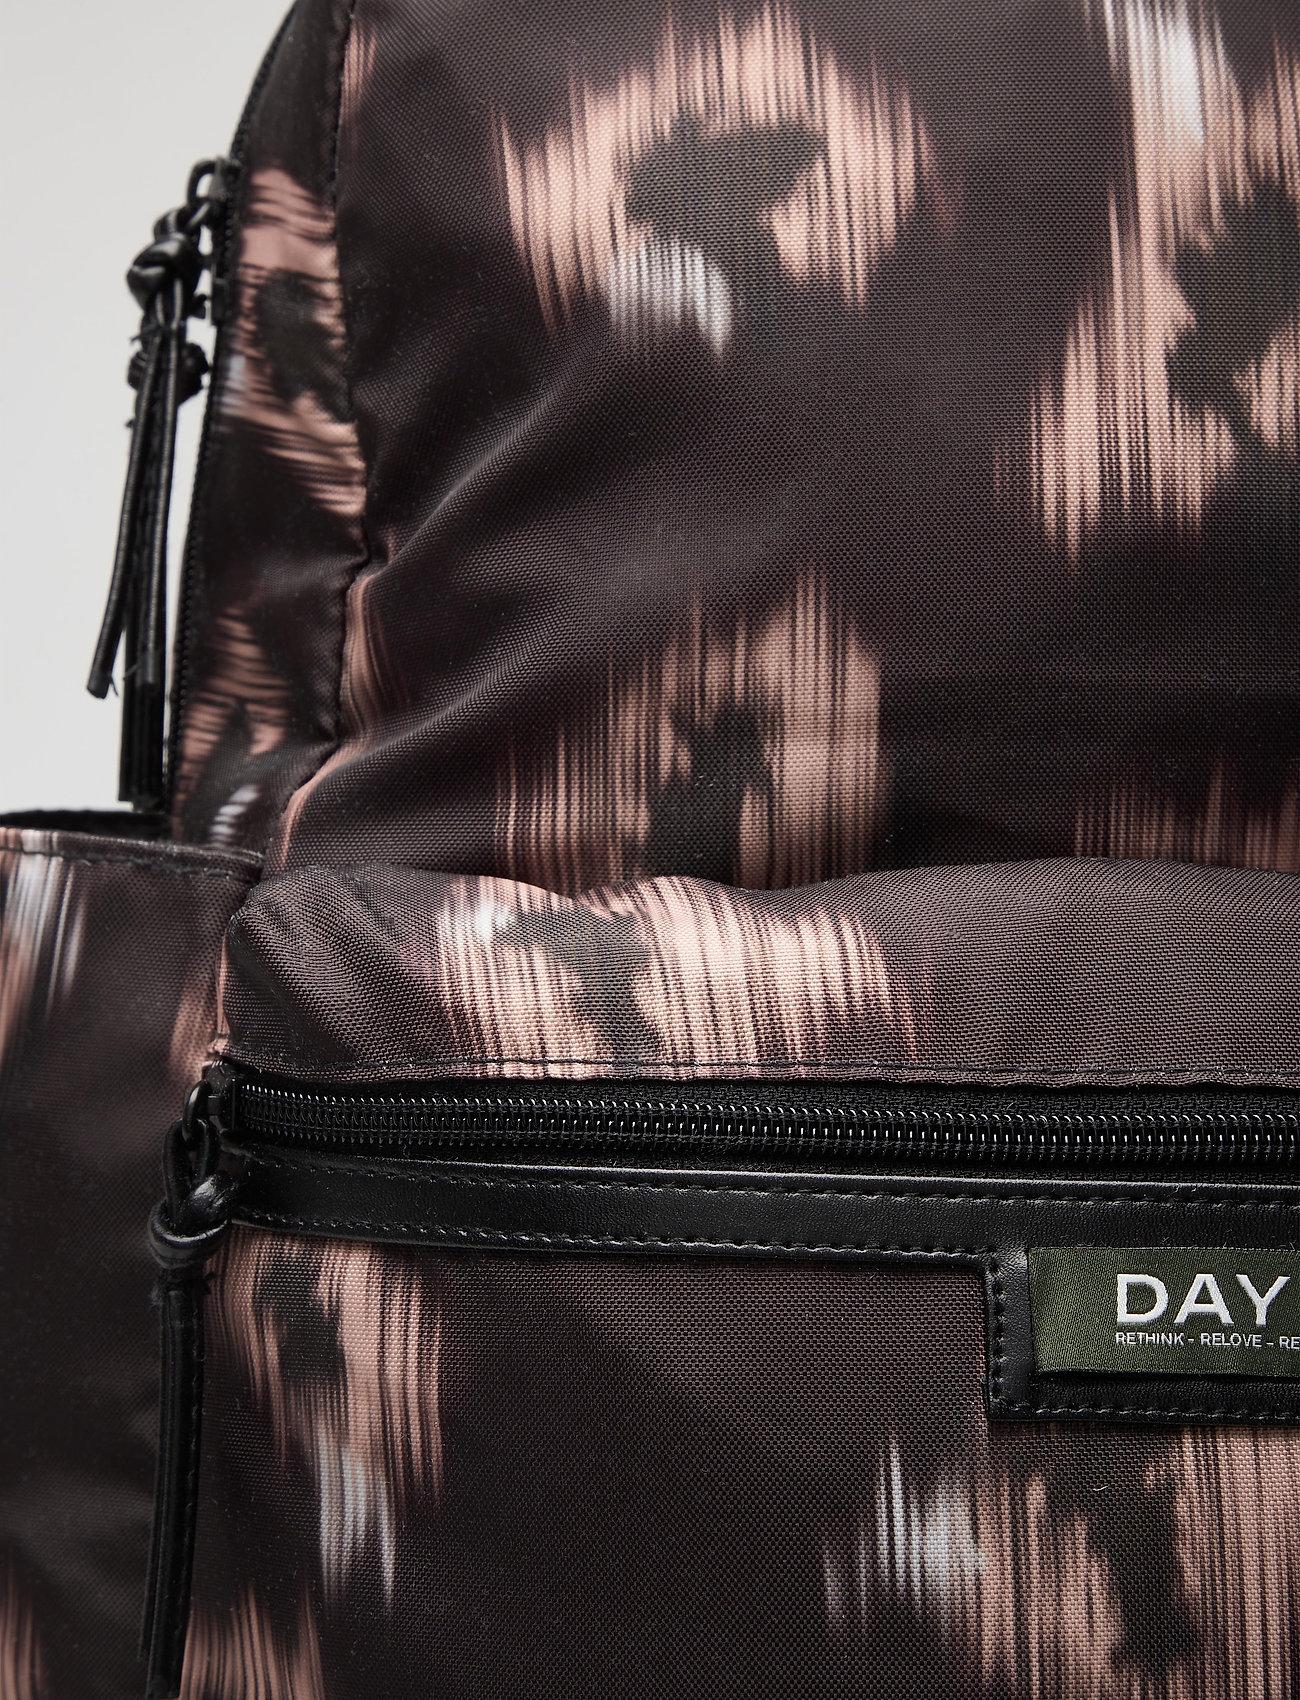 DAY et - Day Gweneth RE-P Ikat BP B - tassen - black - 3